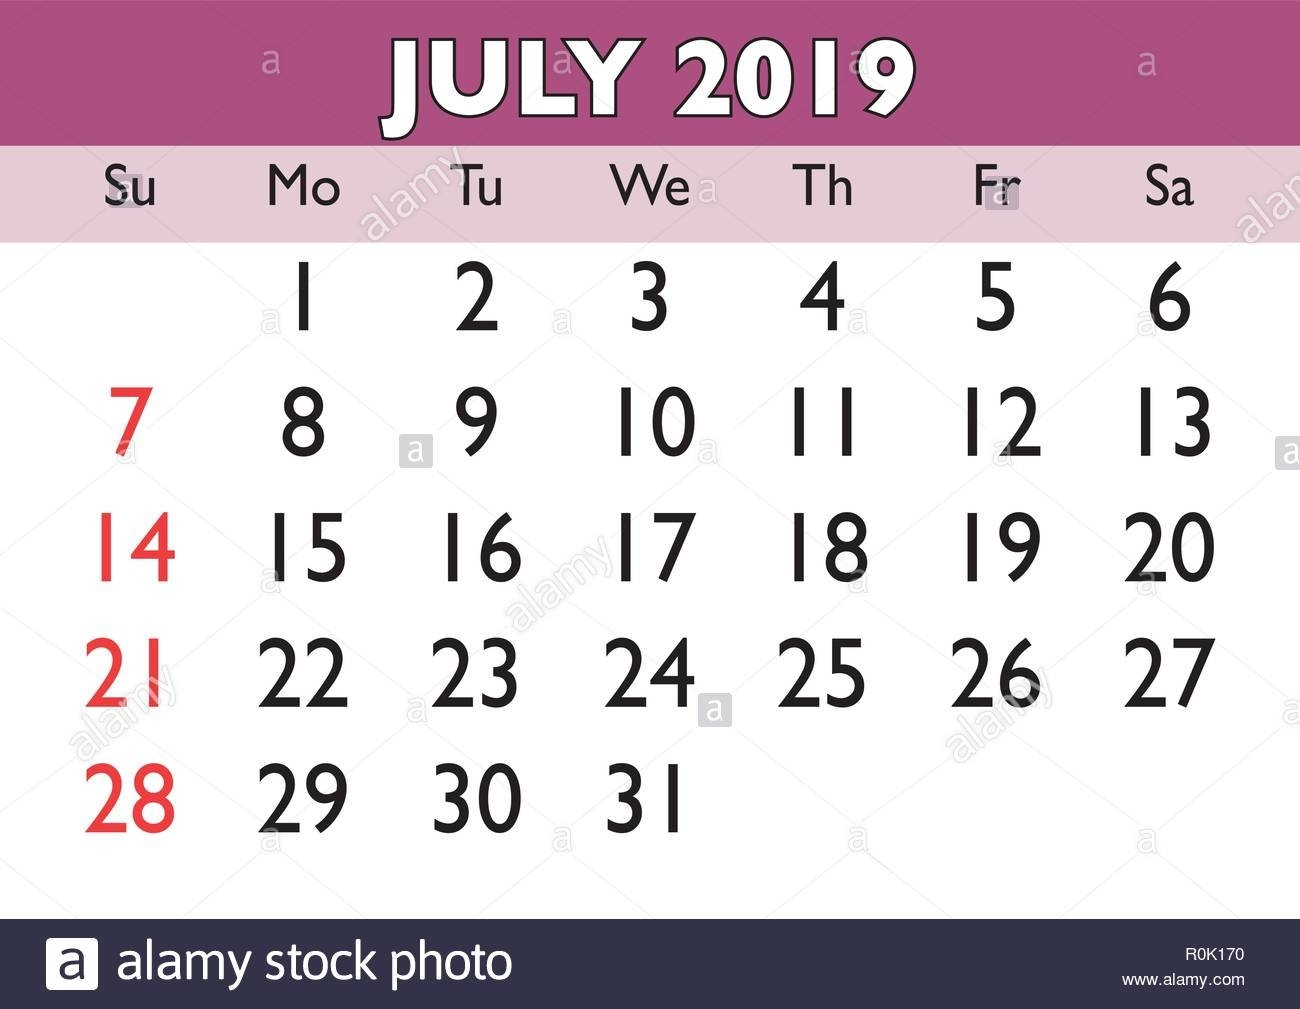 2019 Calendar July Month. Vector Printable Calendar. Monthly July 9 2019 Calendar